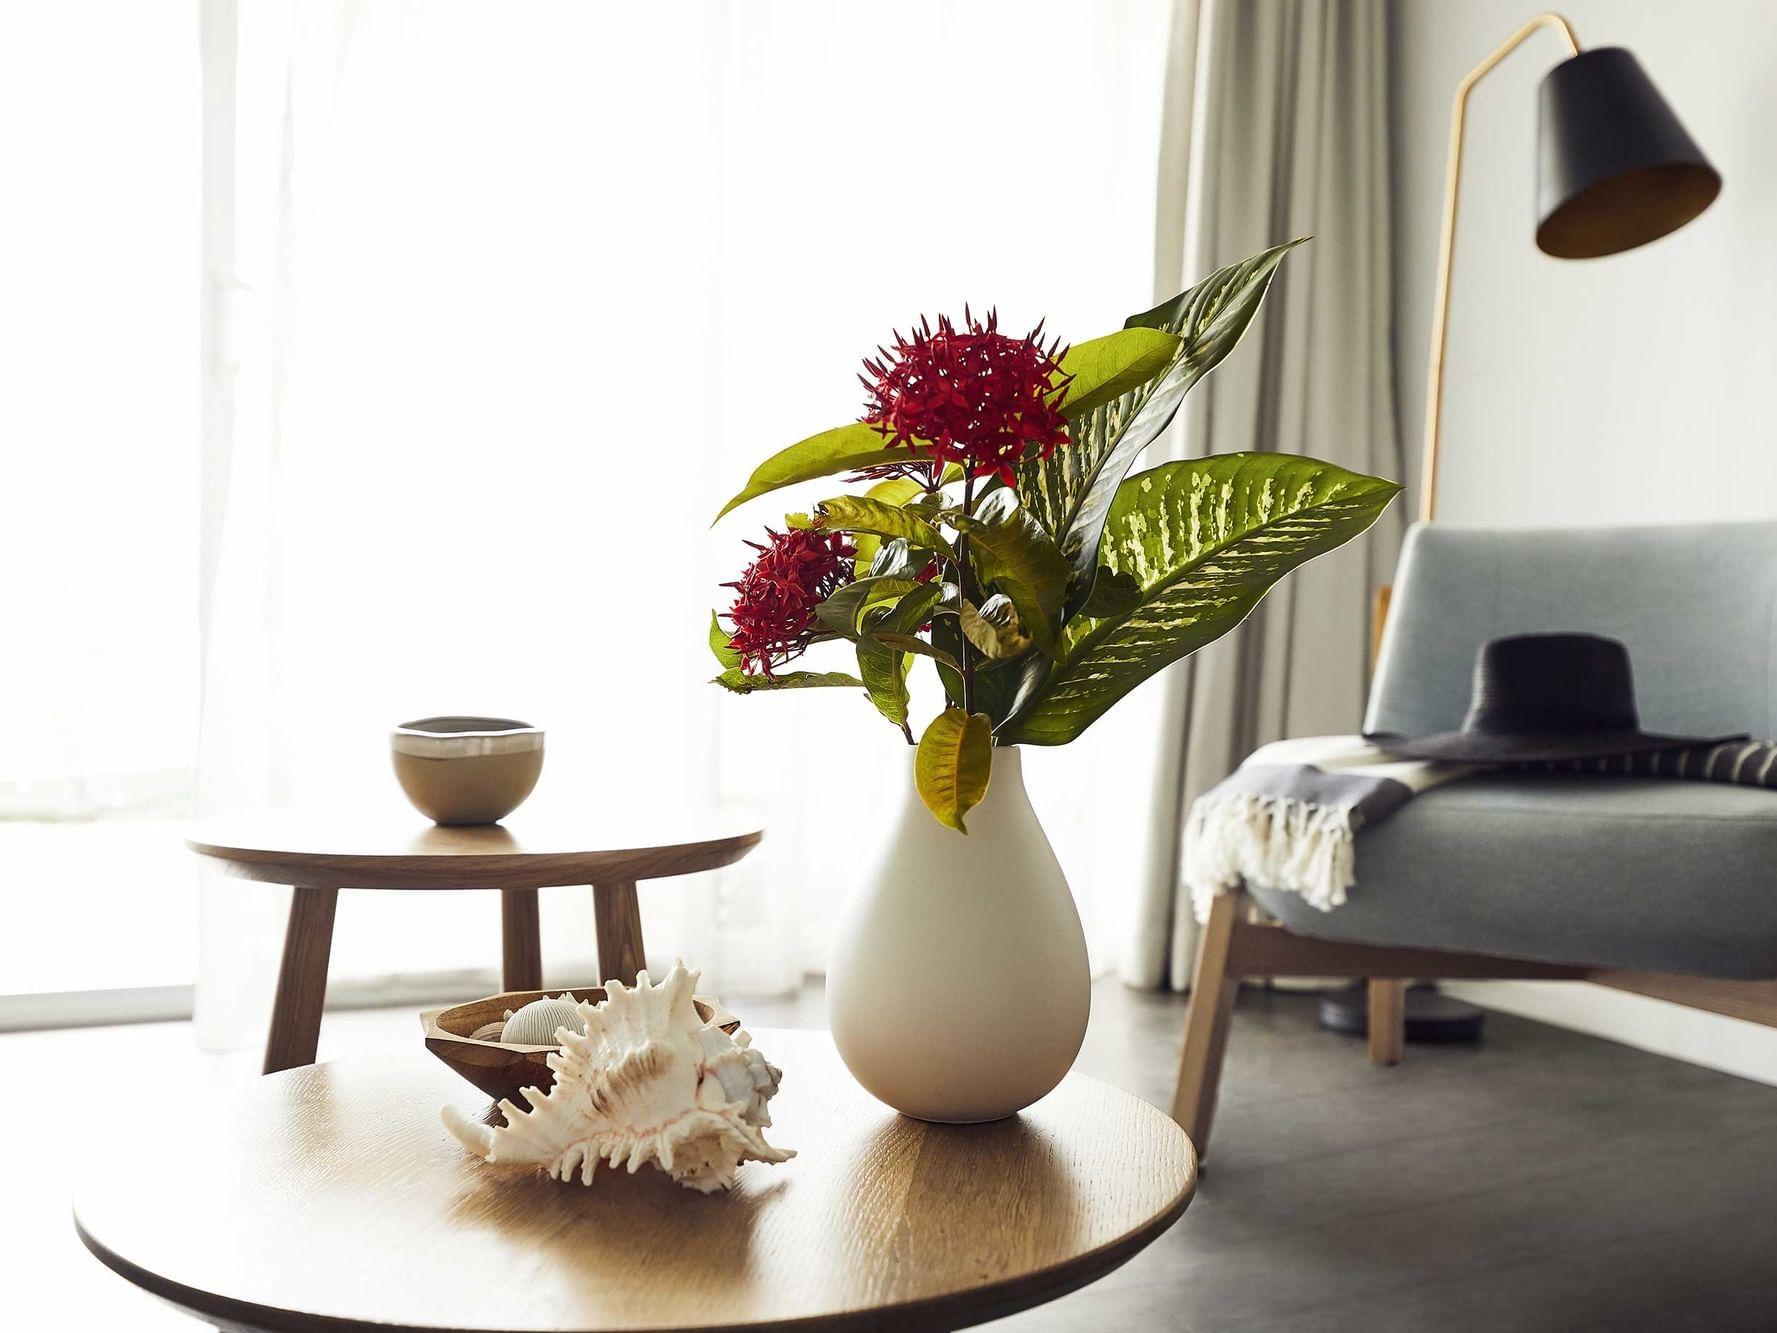 Flower vase in Resort Room at Daydream Island Resort